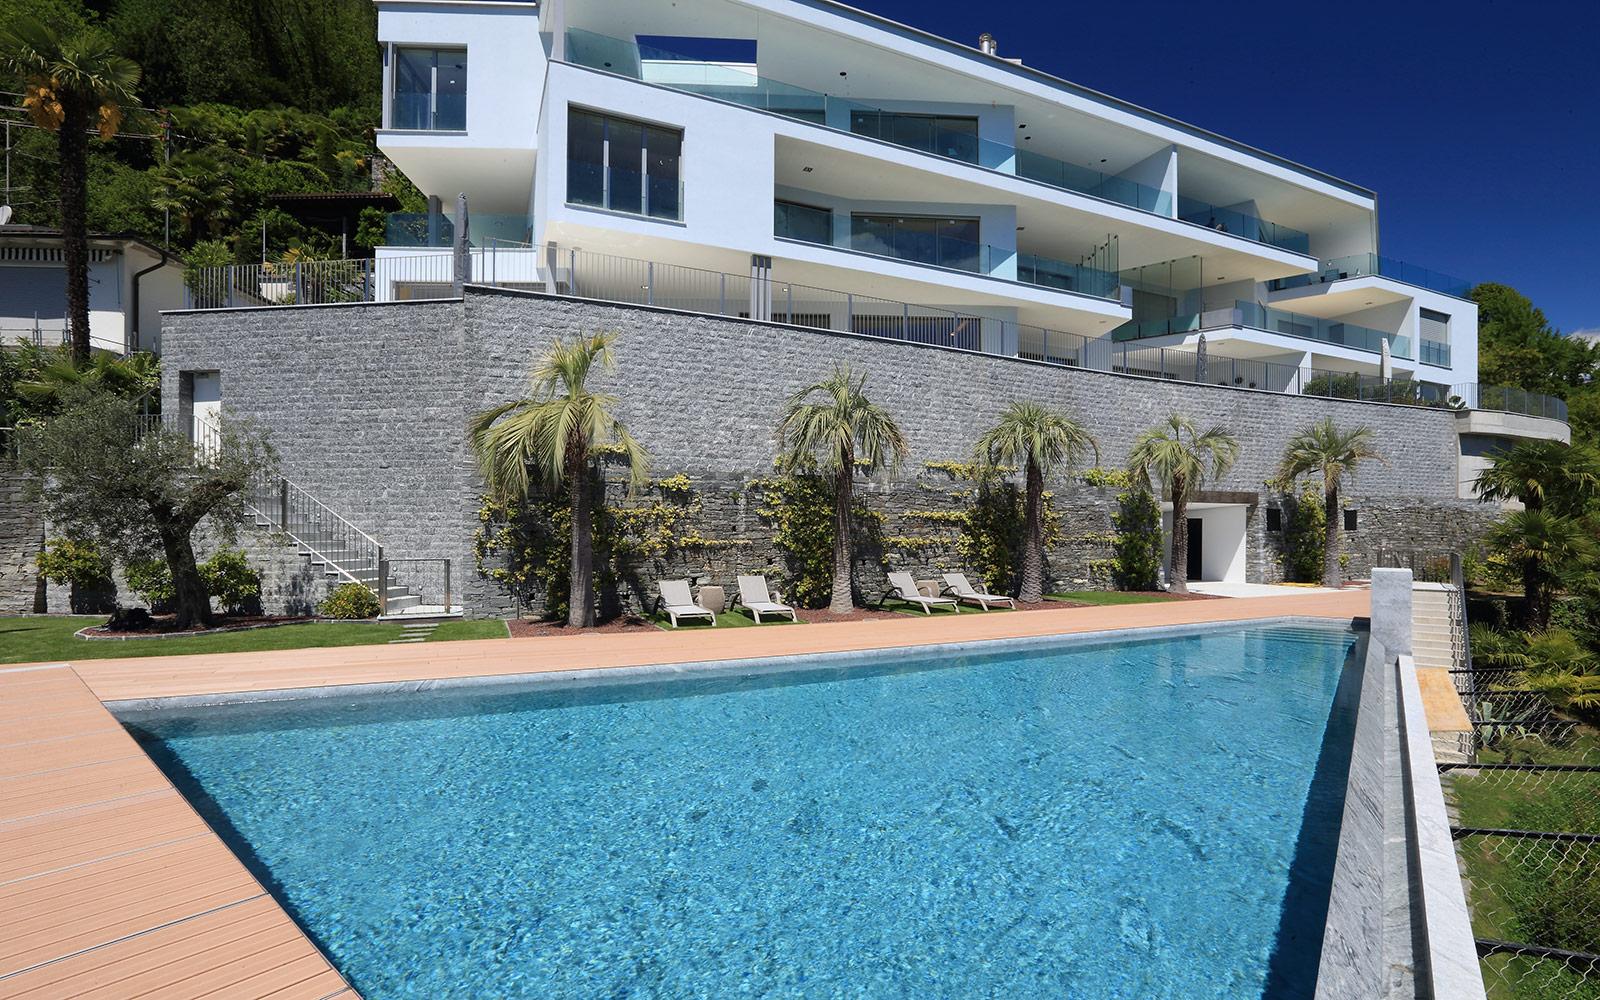 Villa-Gioia-finita-49.jpg